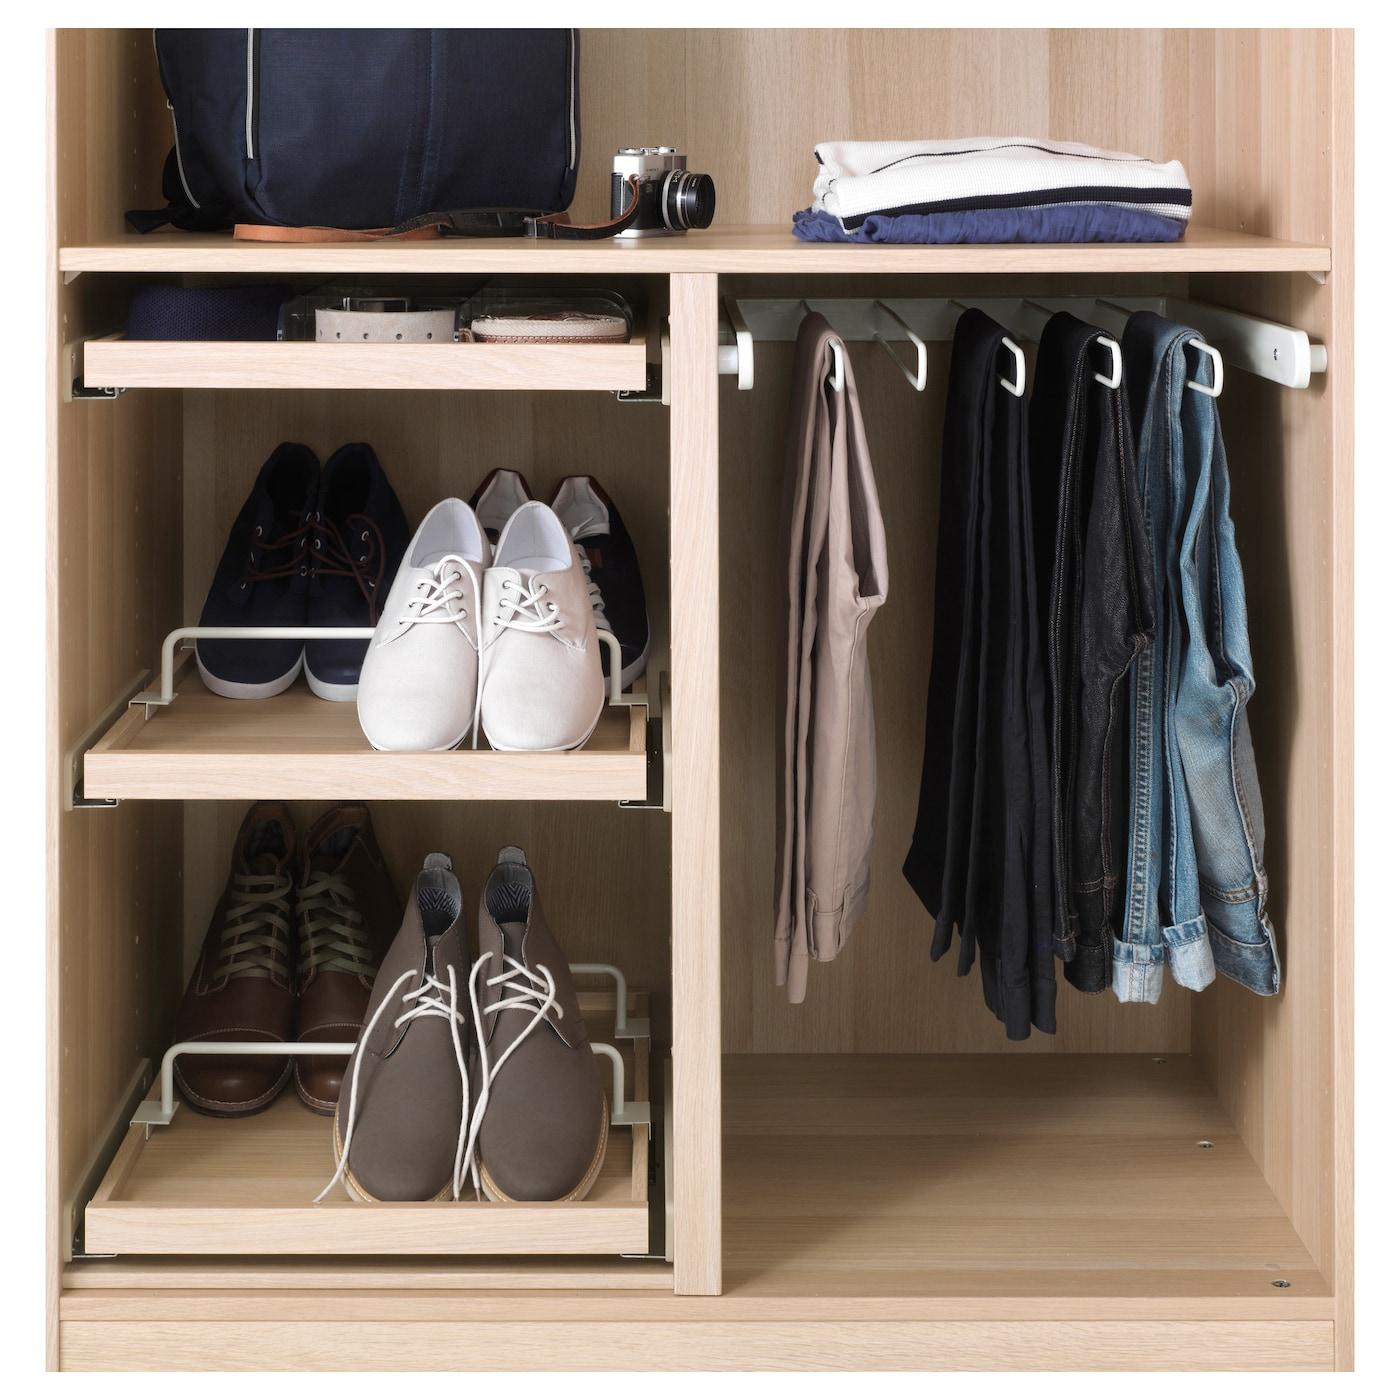 komplement verdeler basiselementen wit gelazuurd eikeneffect 100 x 58 cm ikea. Black Bedroom Furniture Sets. Home Design Ideas